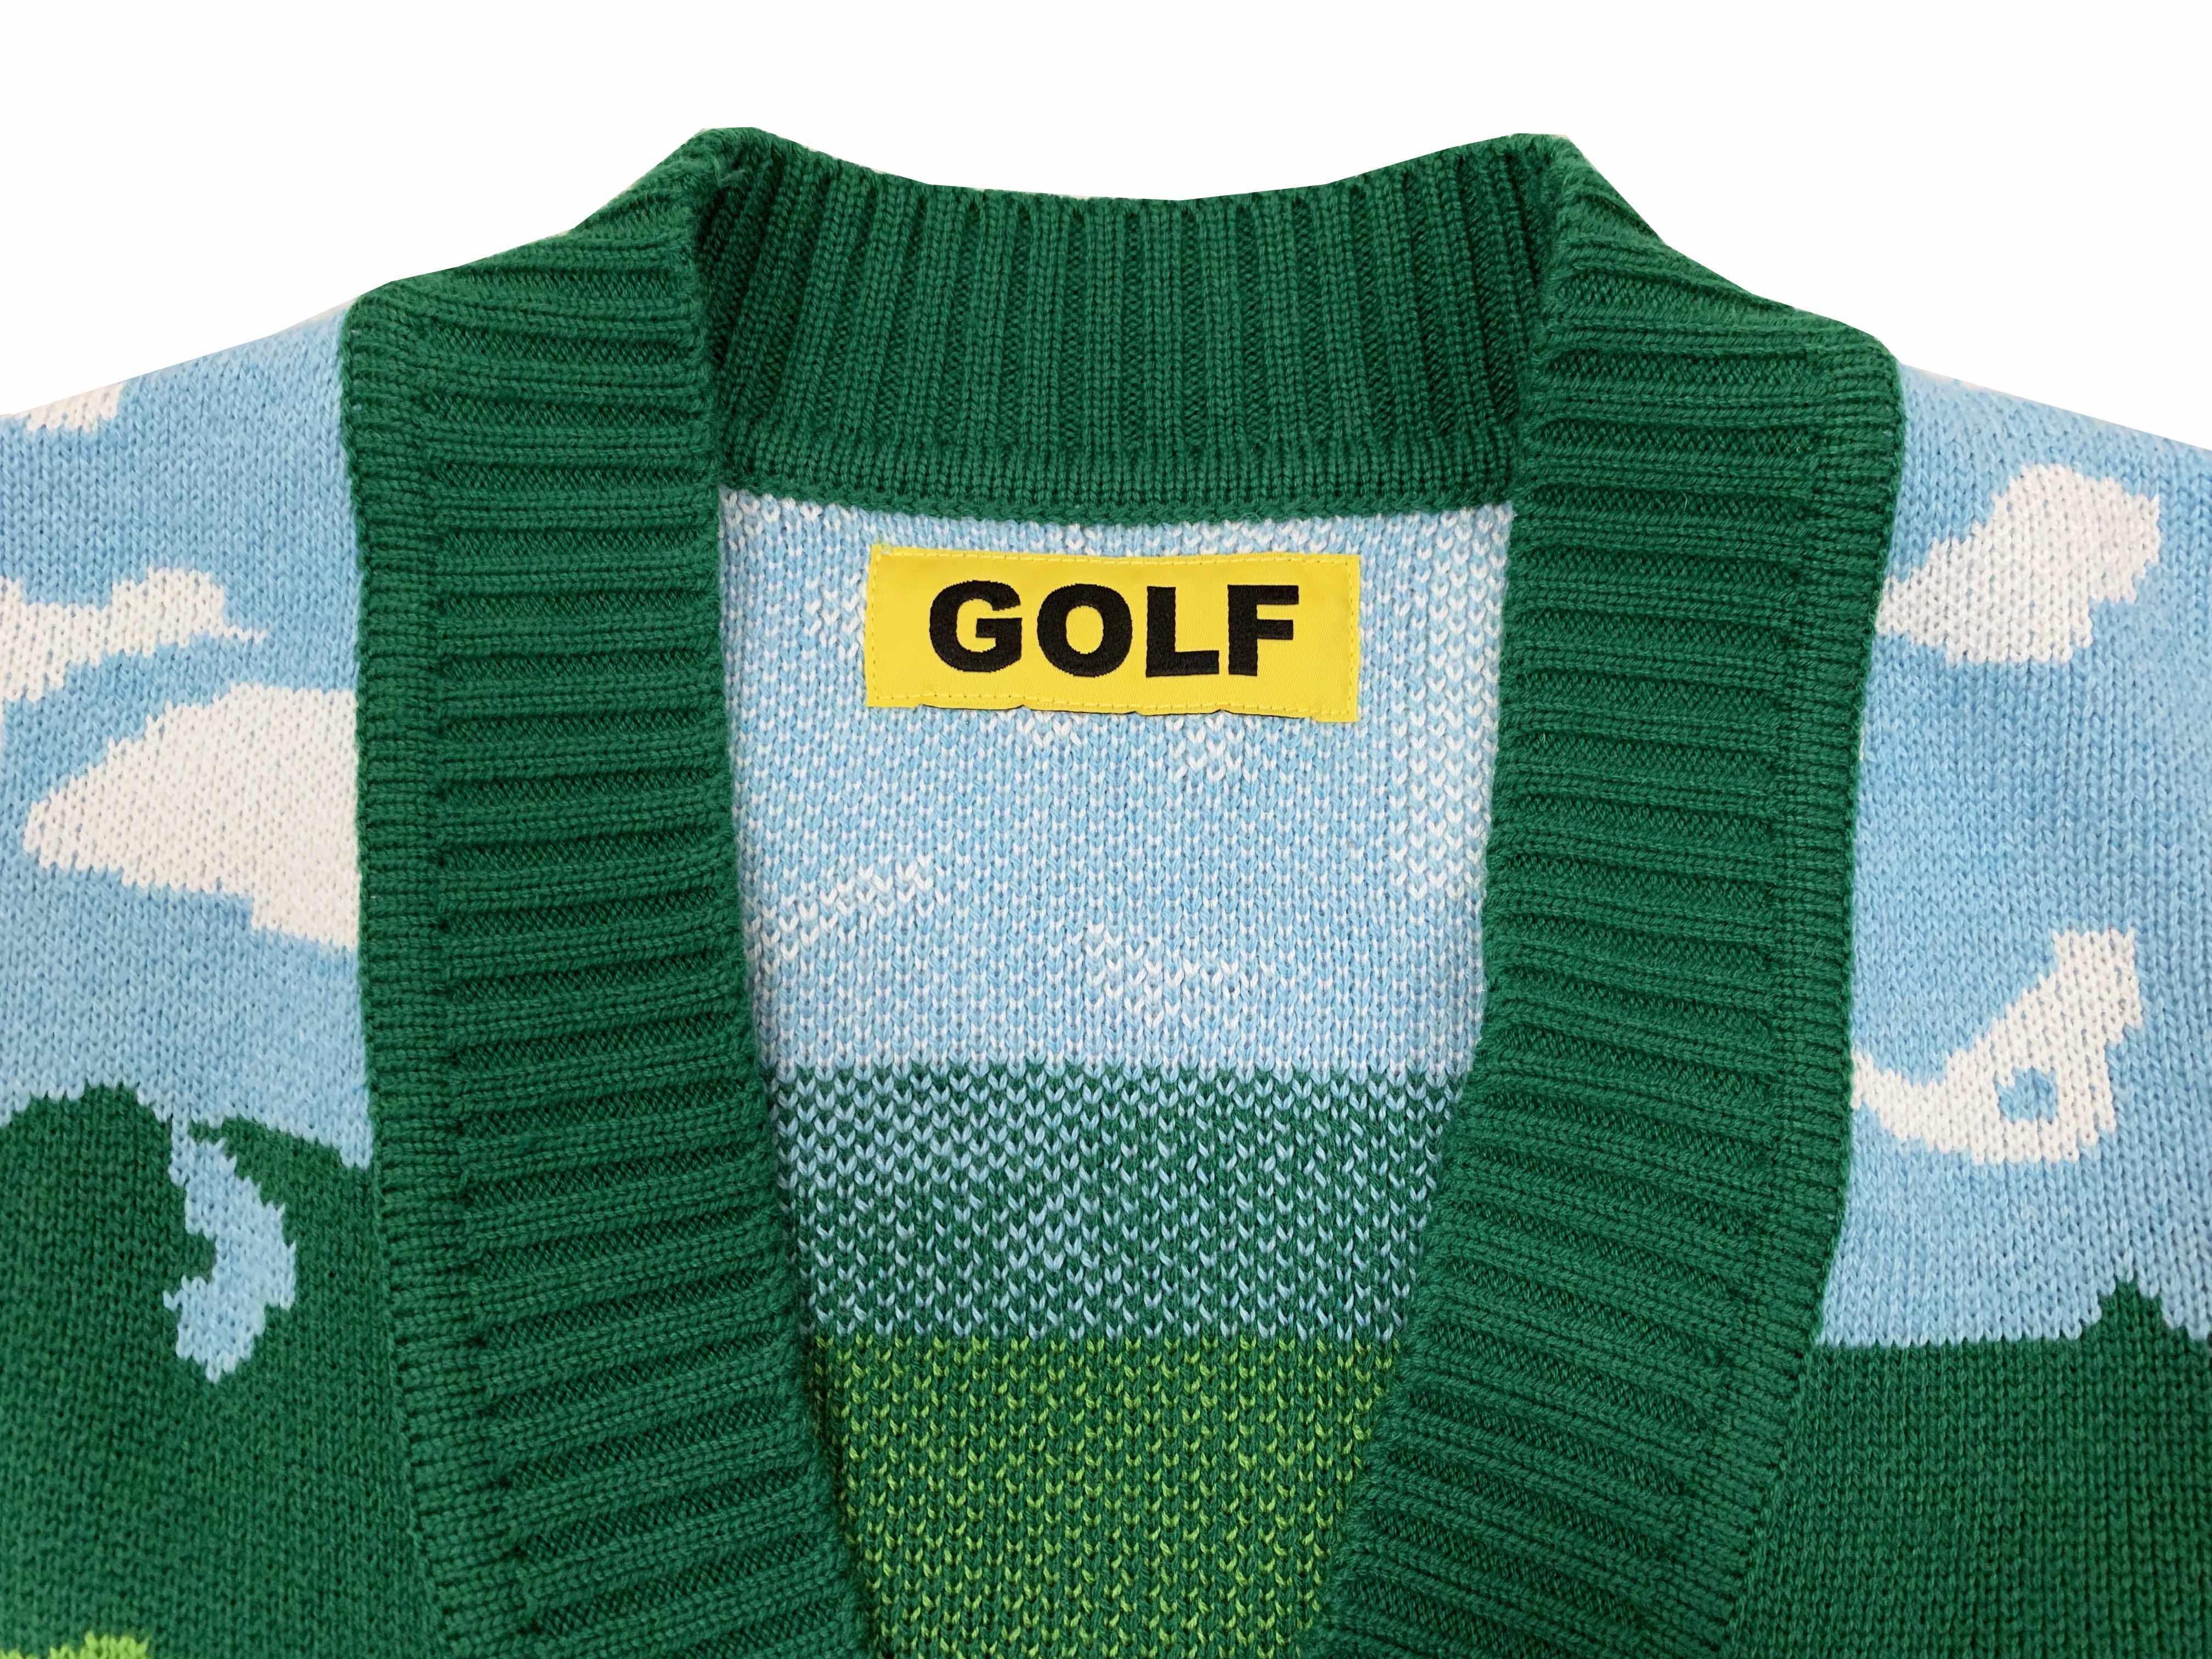 New Luxury Men Golf Flower Le Fleur Tyler The Creator Landscape Casual Sweaters Cardigan Asian Plug Size High Drake M14 Aliexpress